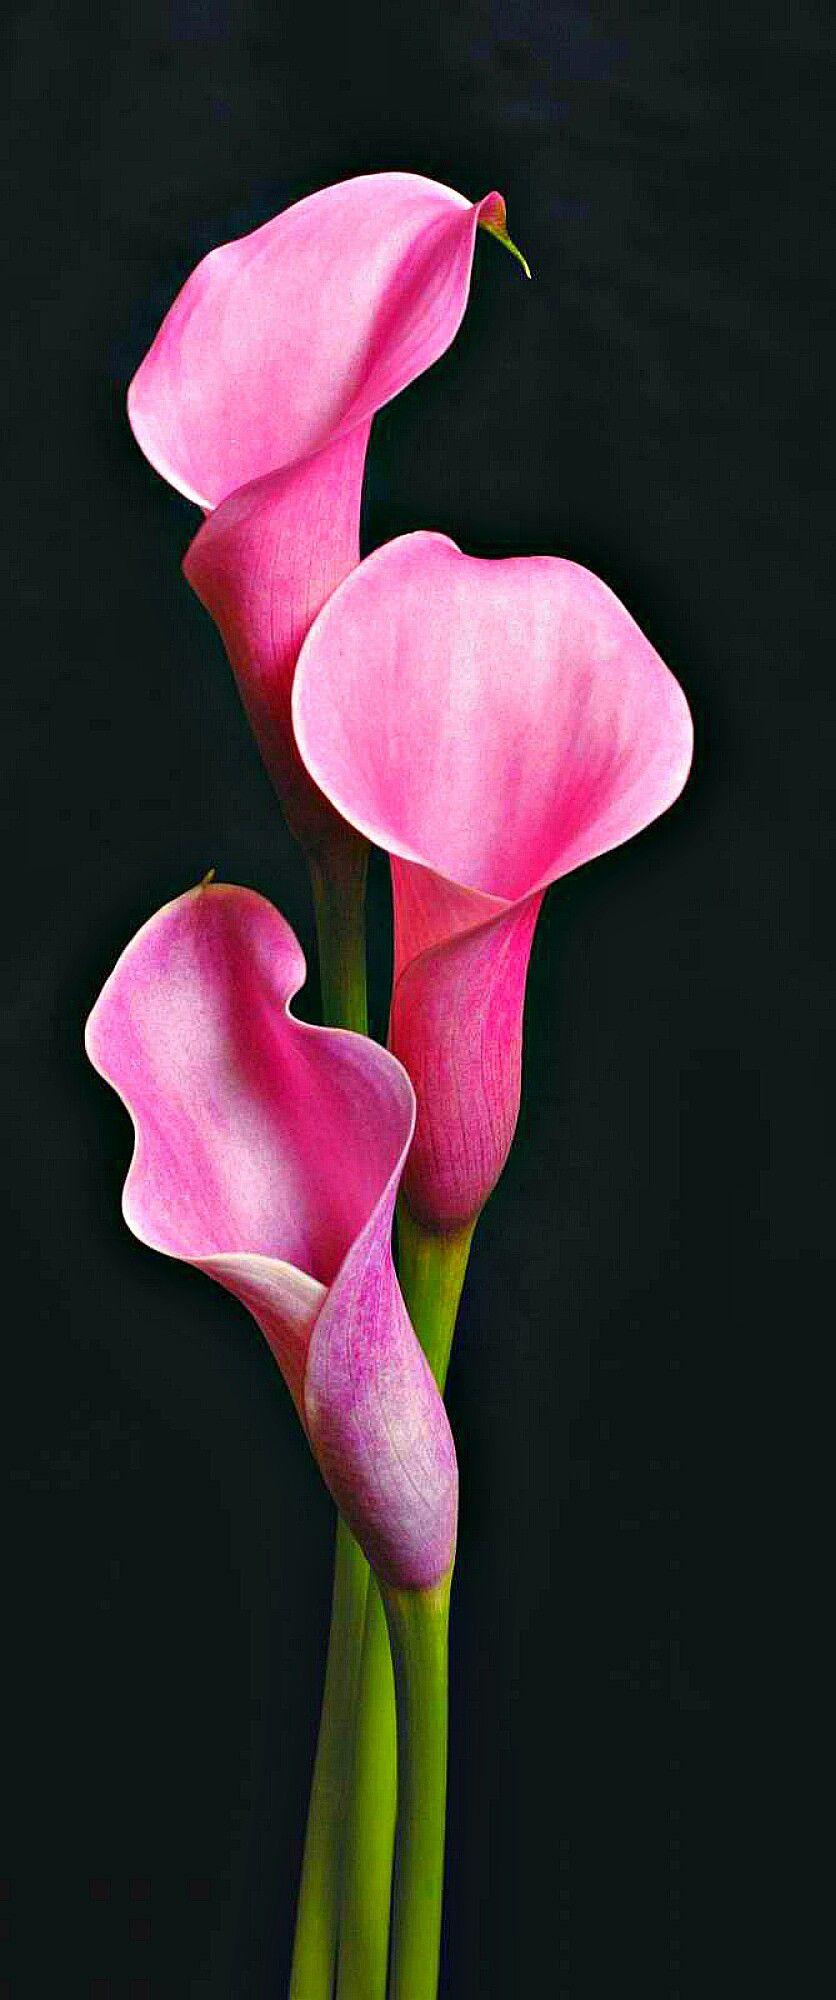 Pin By Irma Irala On Fiori Lily Flower Flower Art Calla Lily